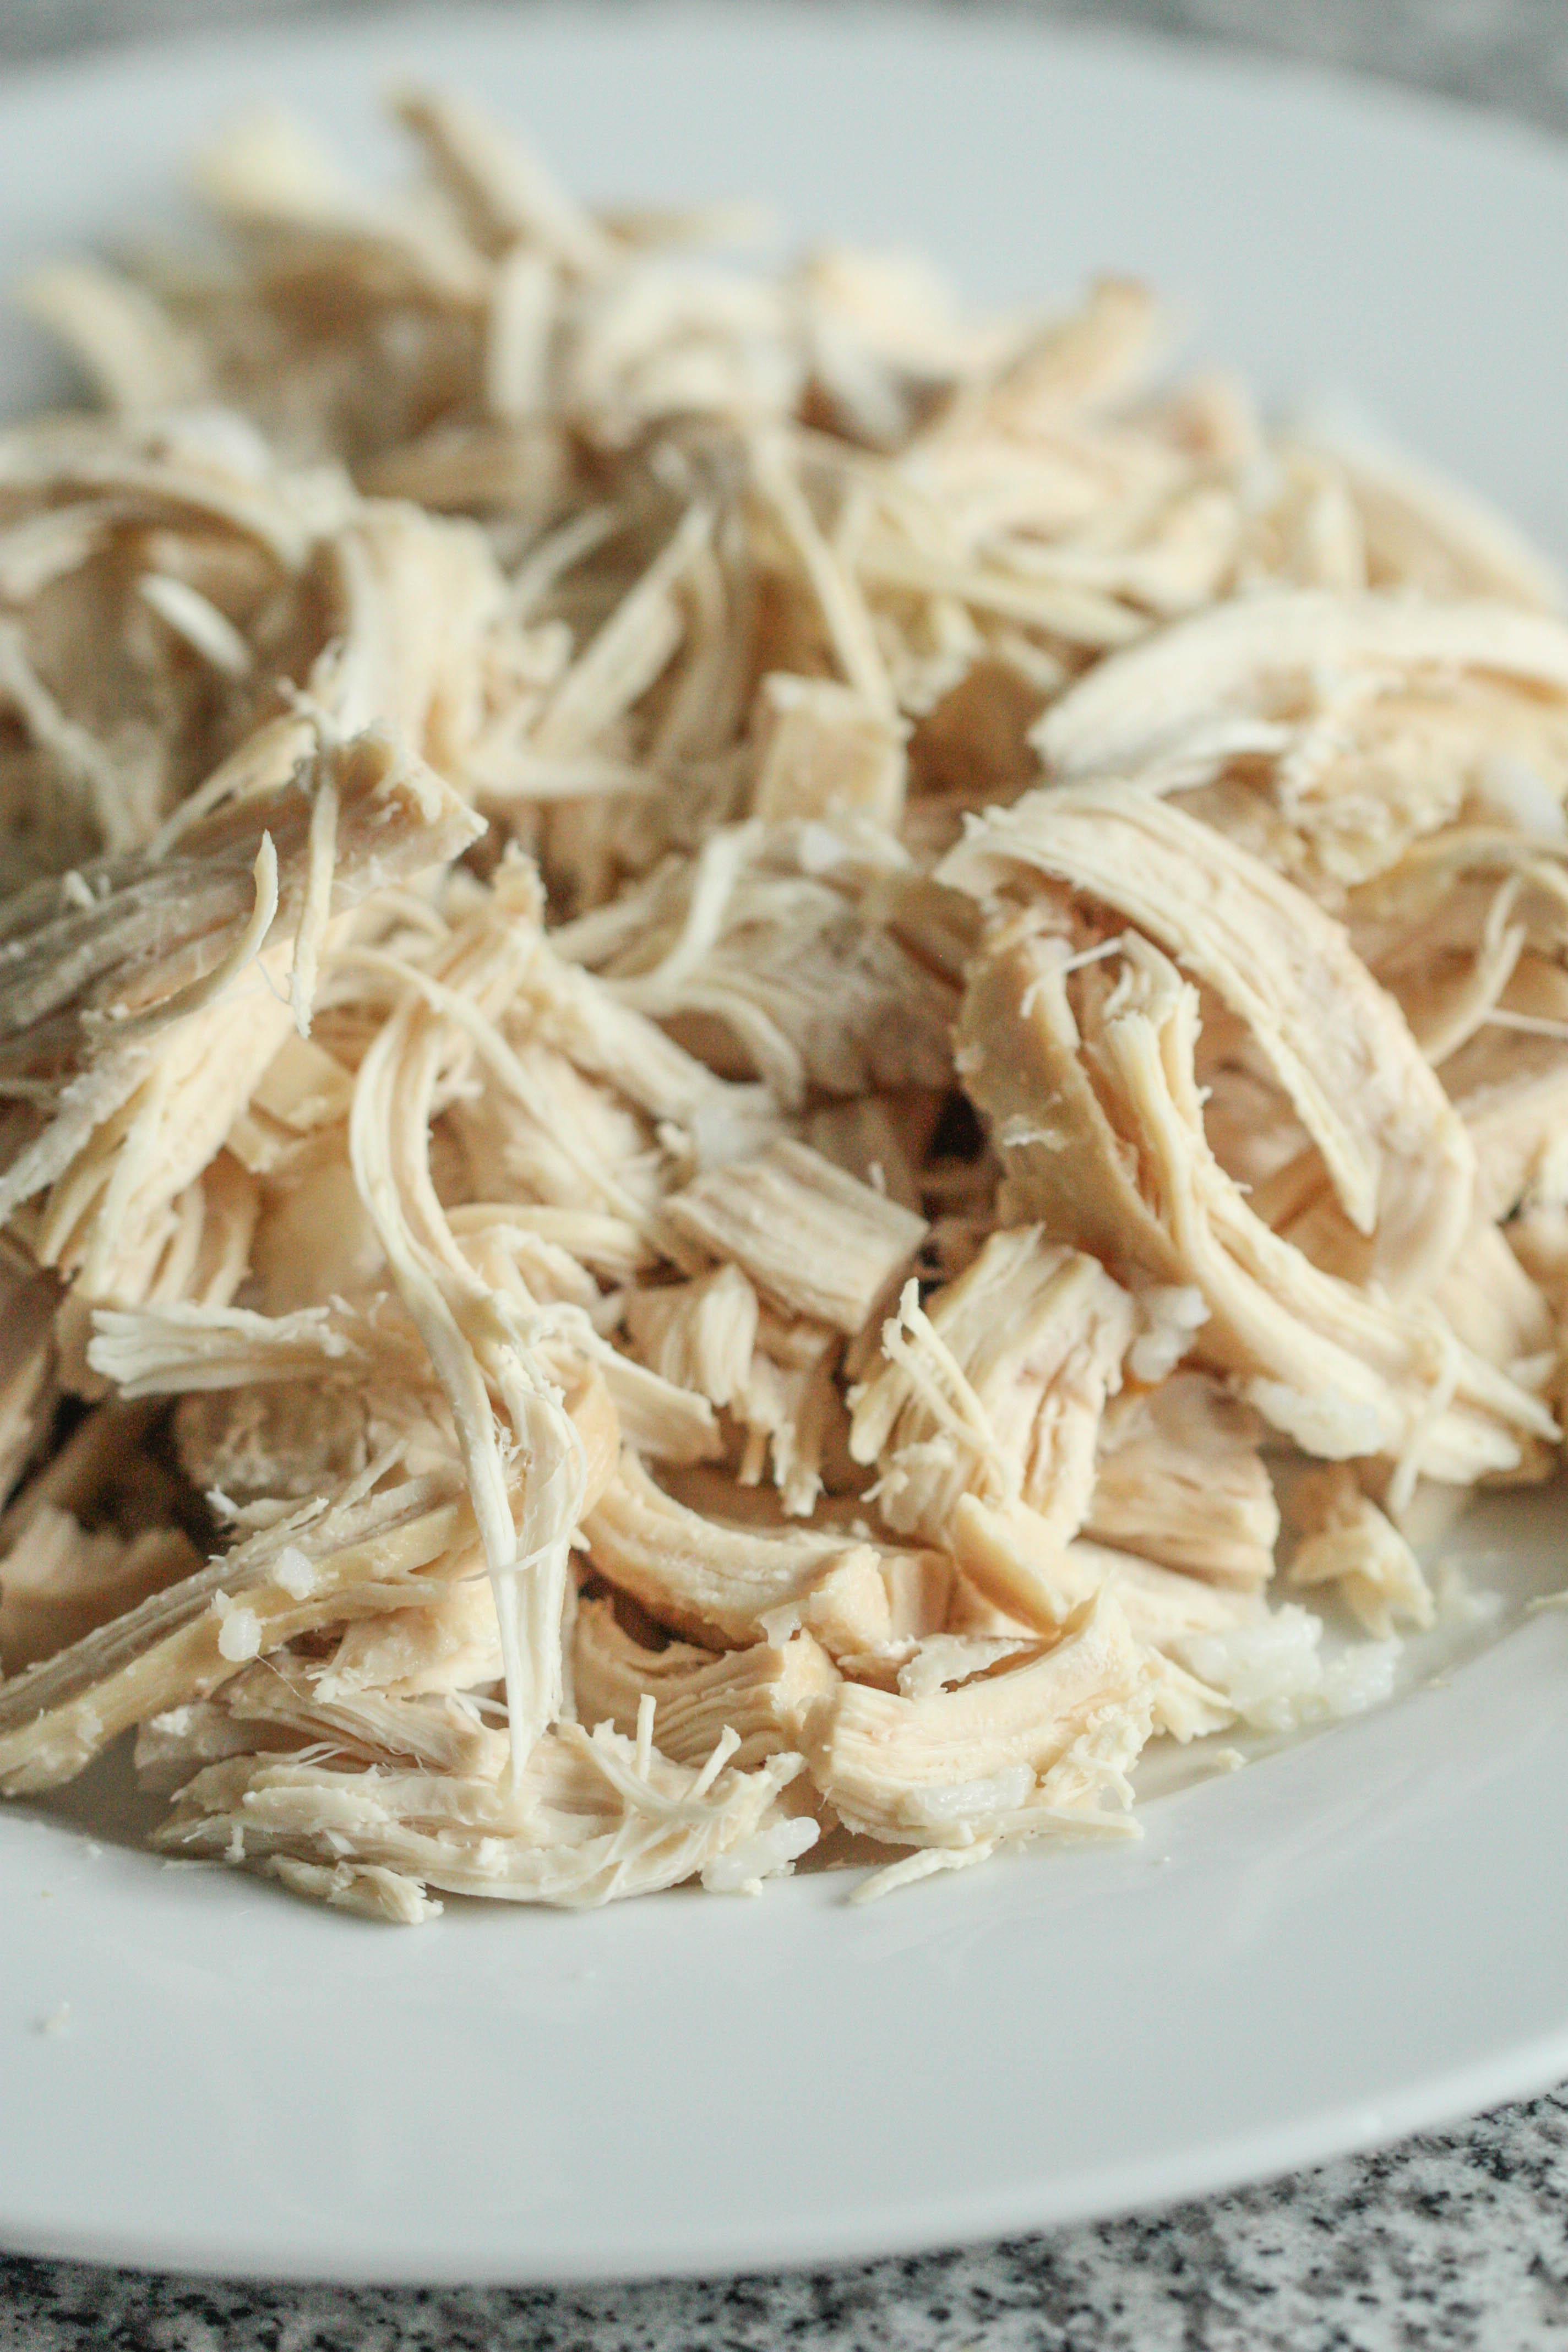 shredded, cooked chicken before teriyaki sauce is added